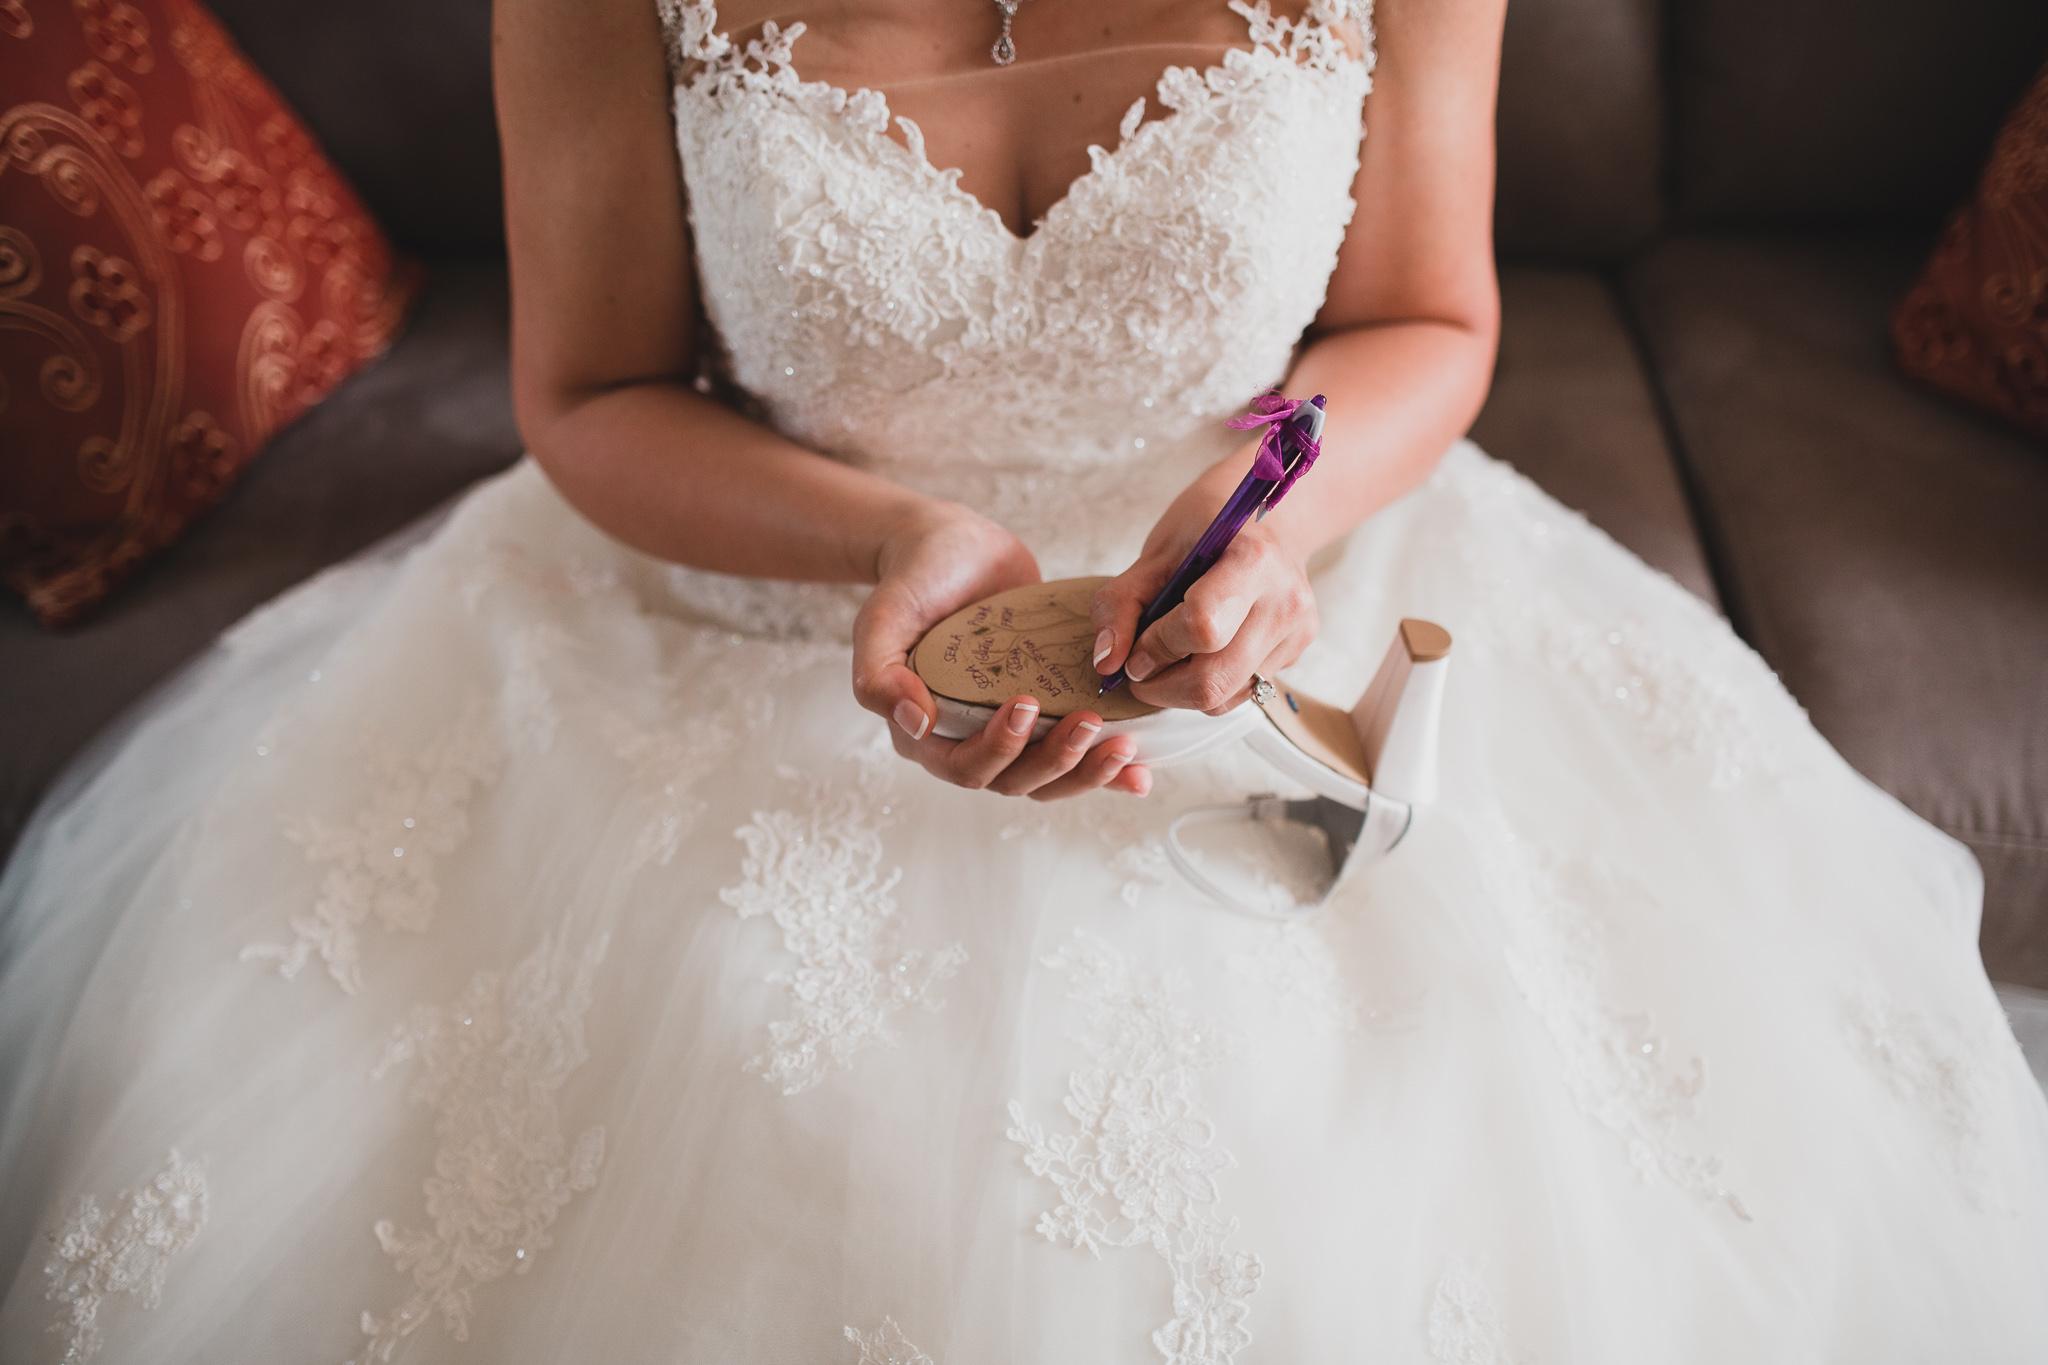 Turkish Shoe-Signing Tradition, Wedding